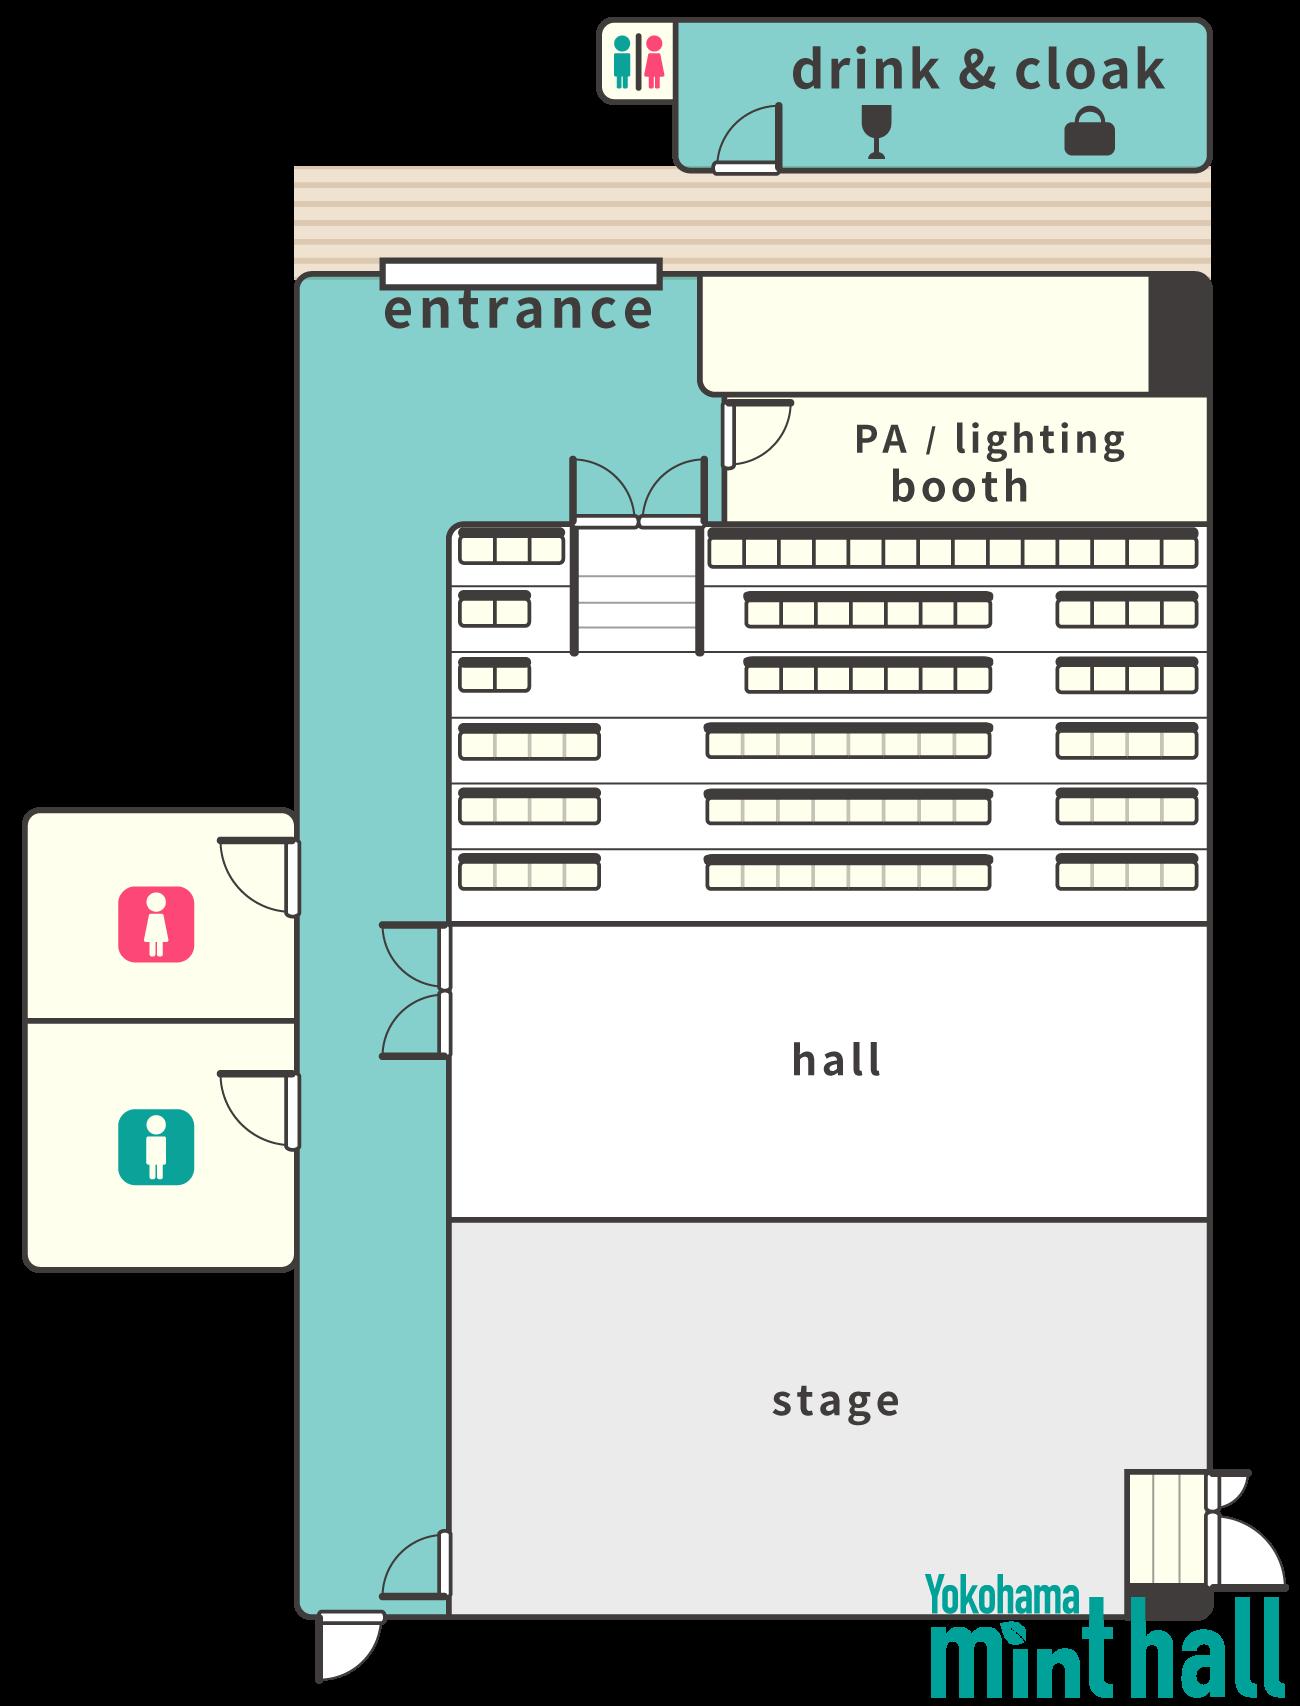 Yokohama mint hall floor map